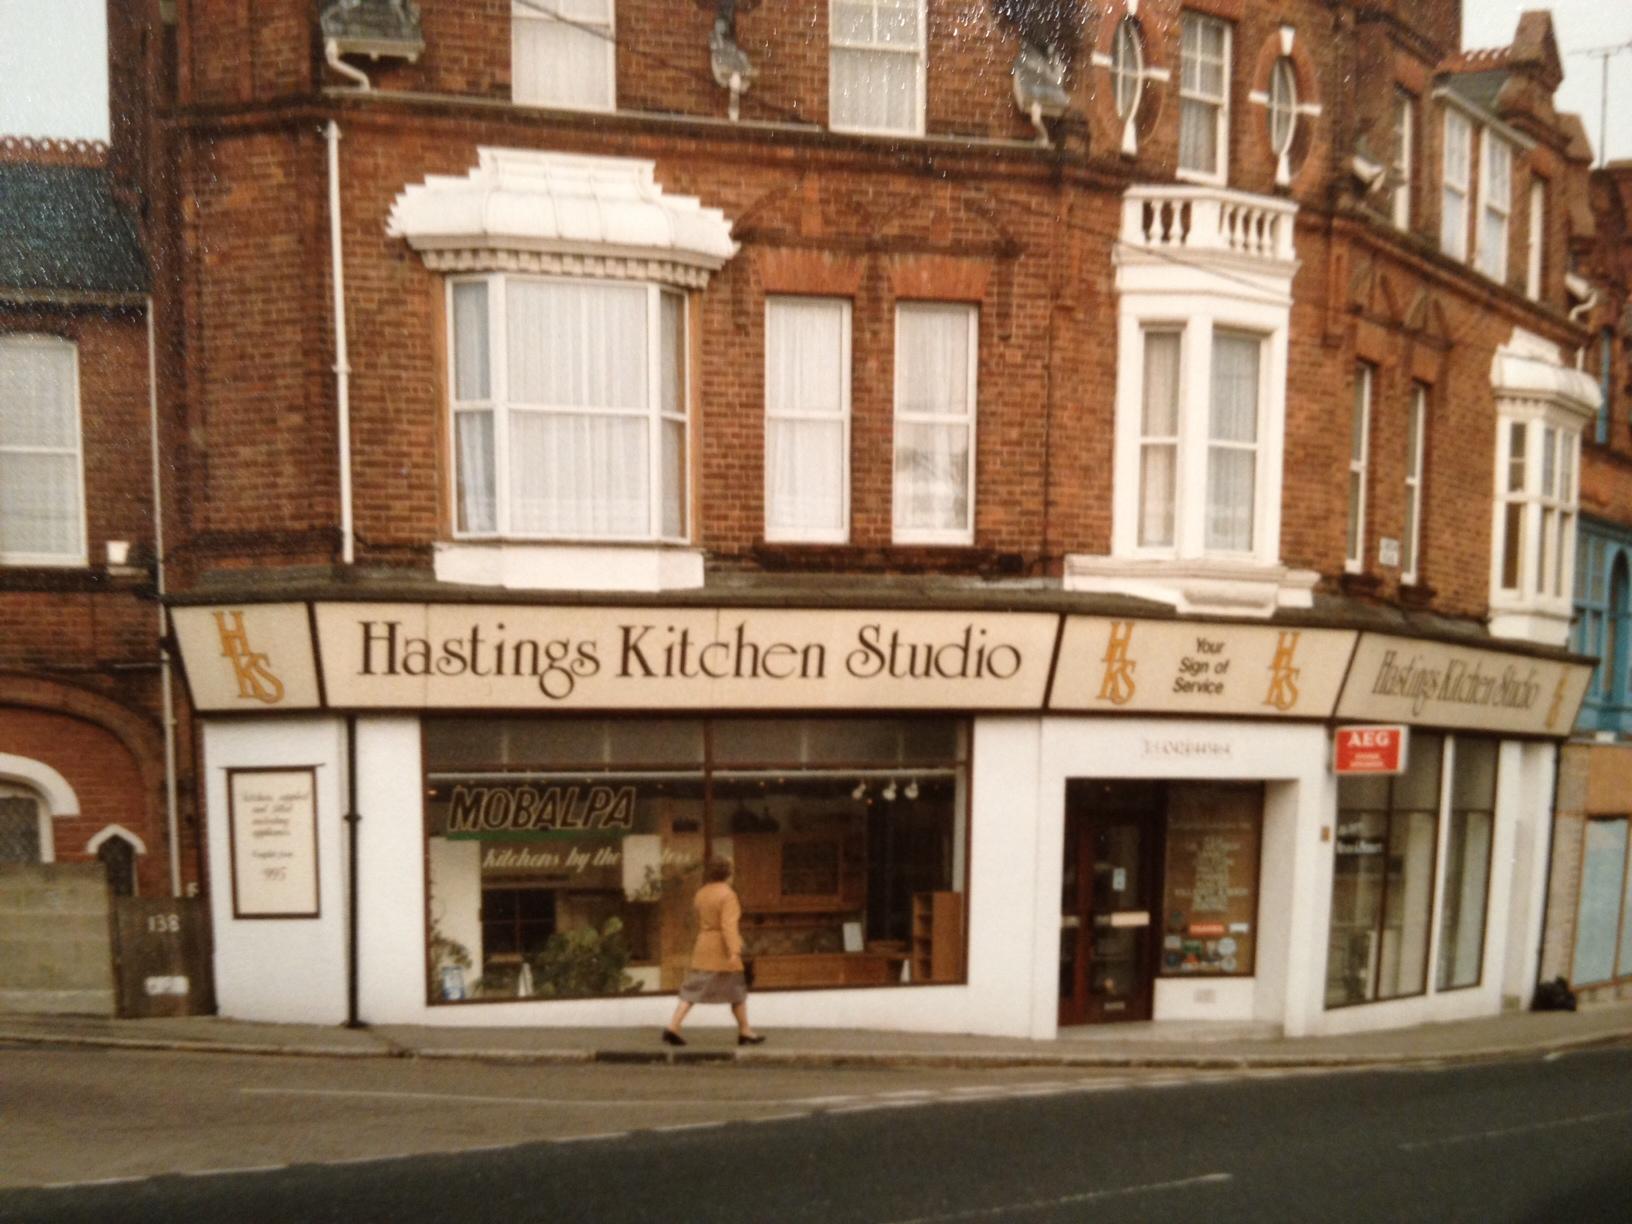 Hastings Kitchen Studio